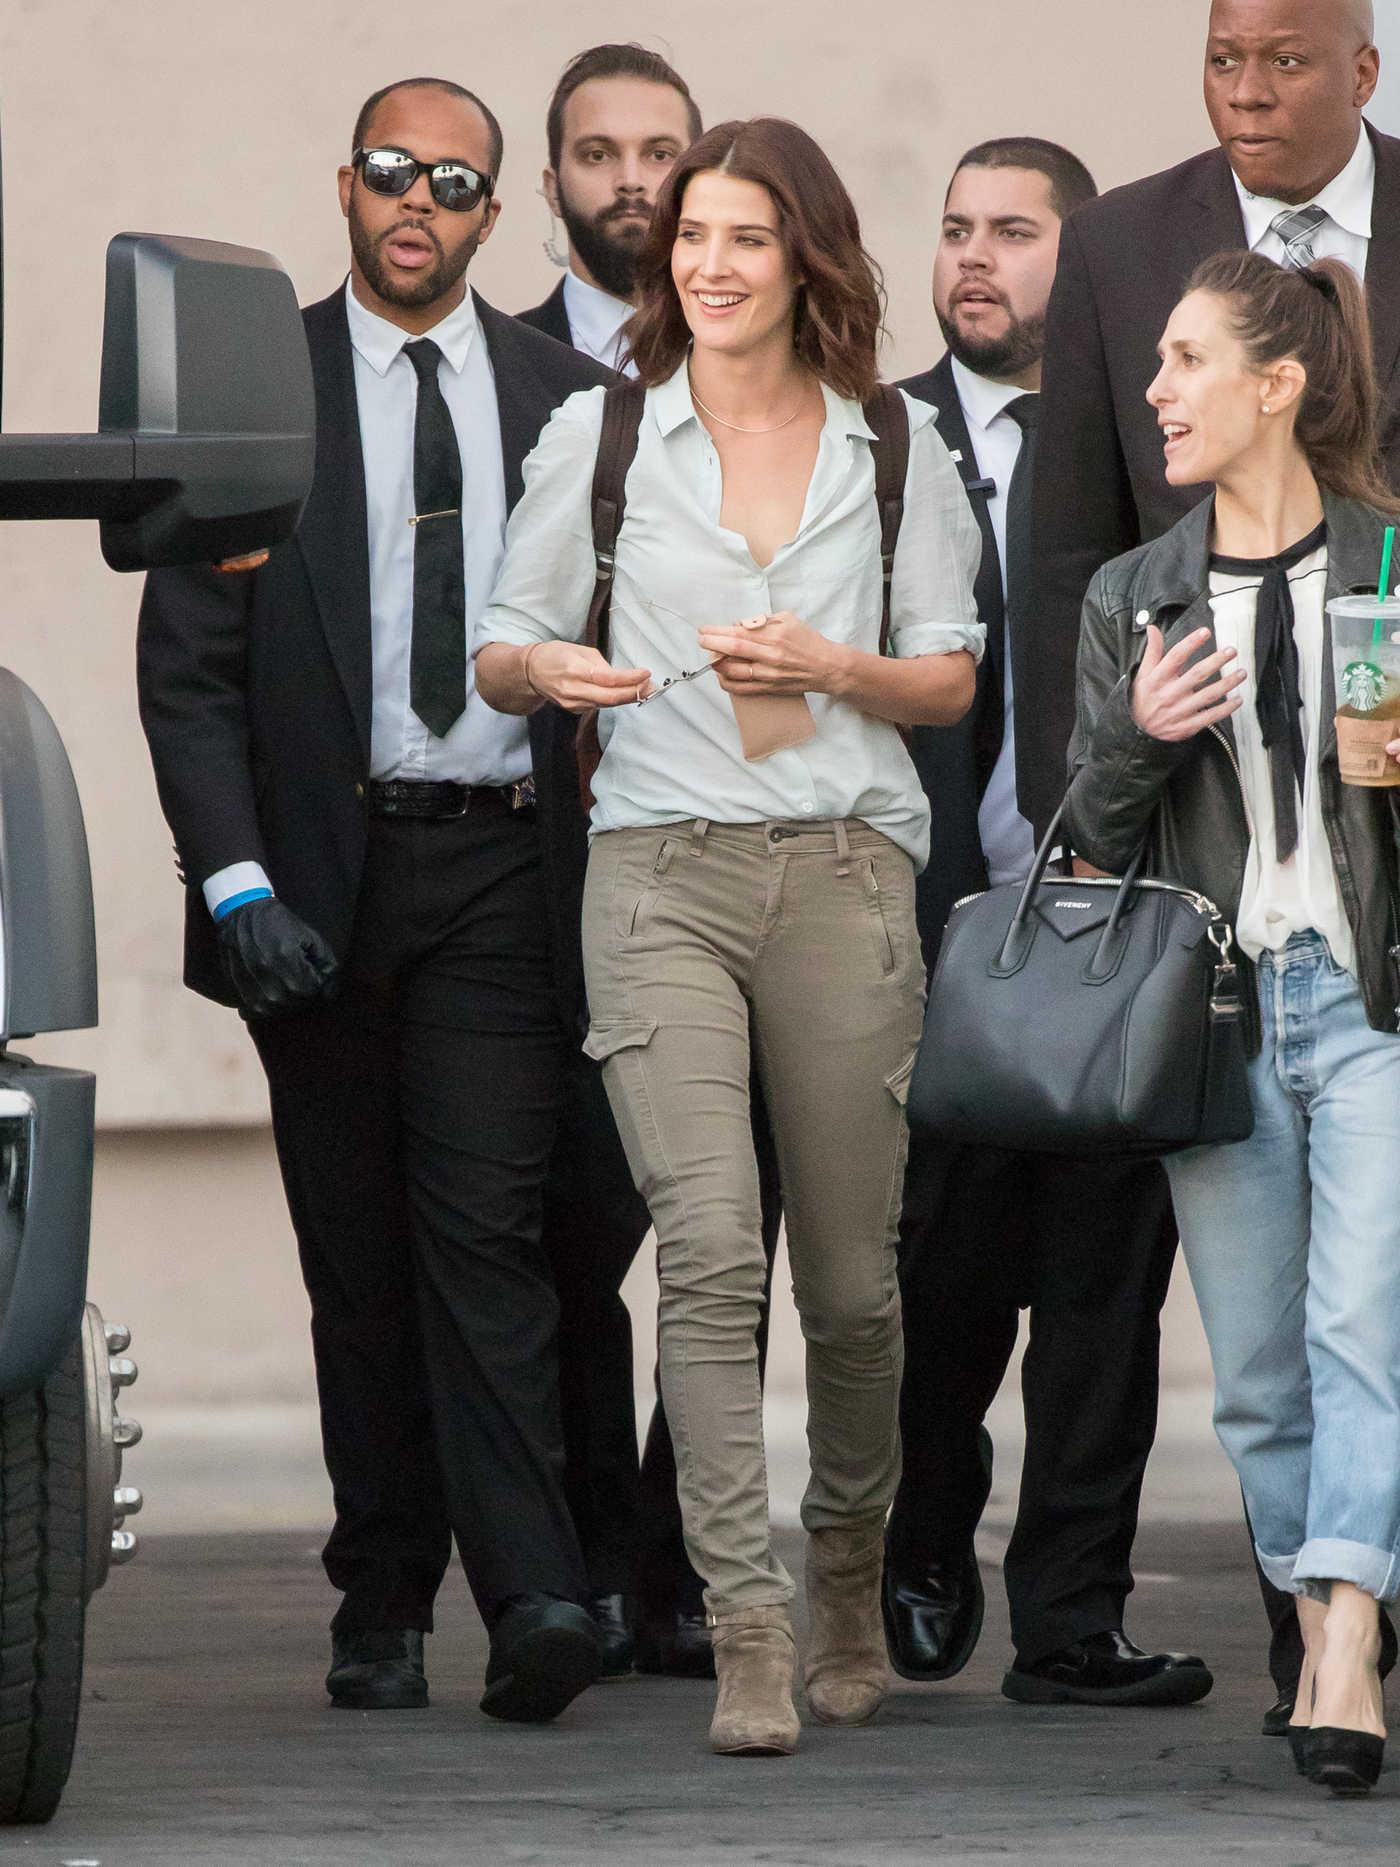 Cobie Smulders Arrives at Jimmy Kimmel Live in Los Angeles 10/17/2016